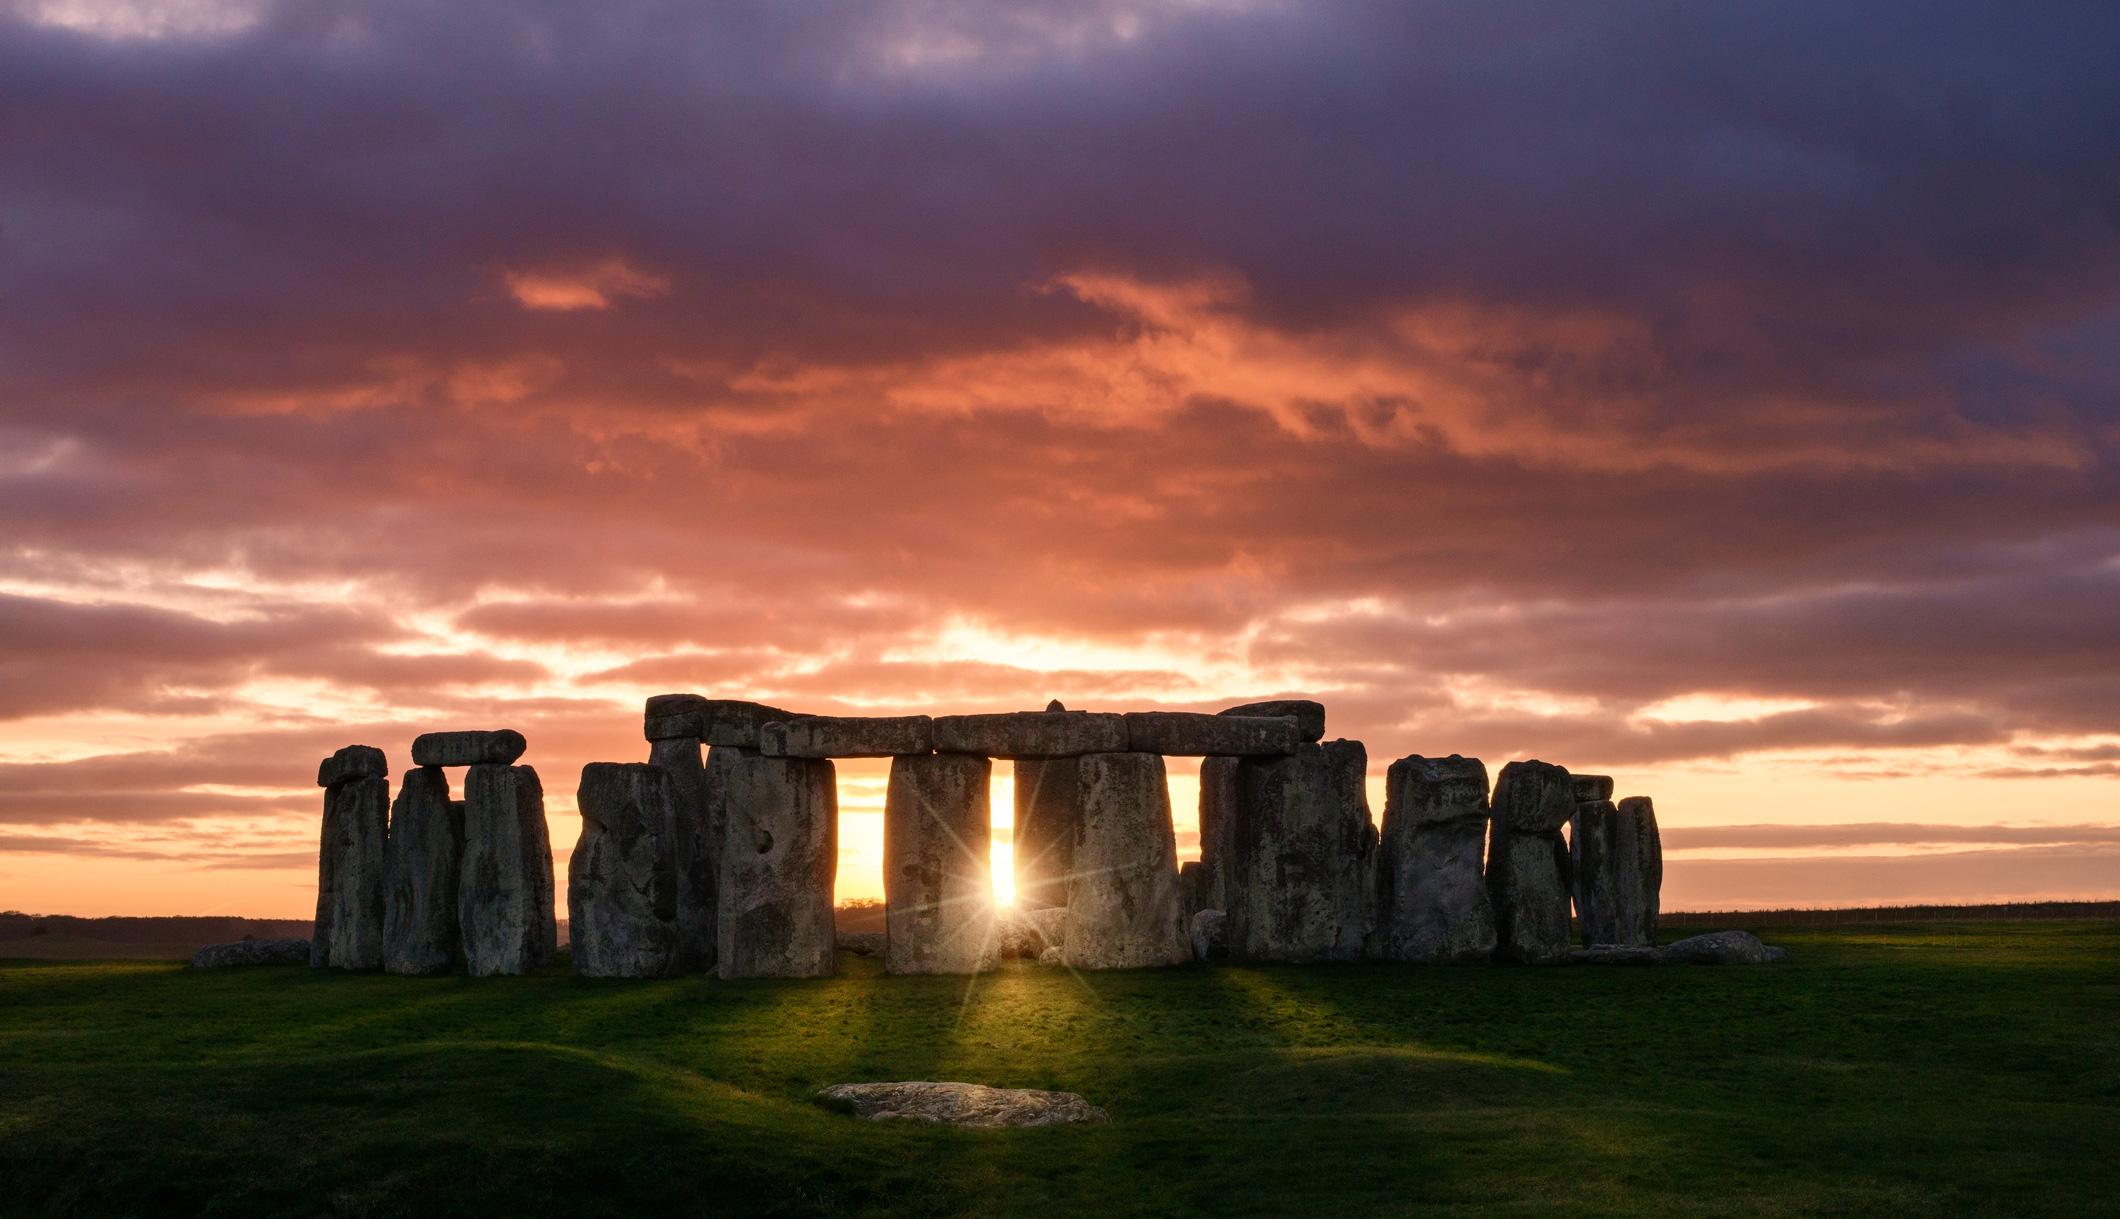 Stonehenge along the Great Stones Way